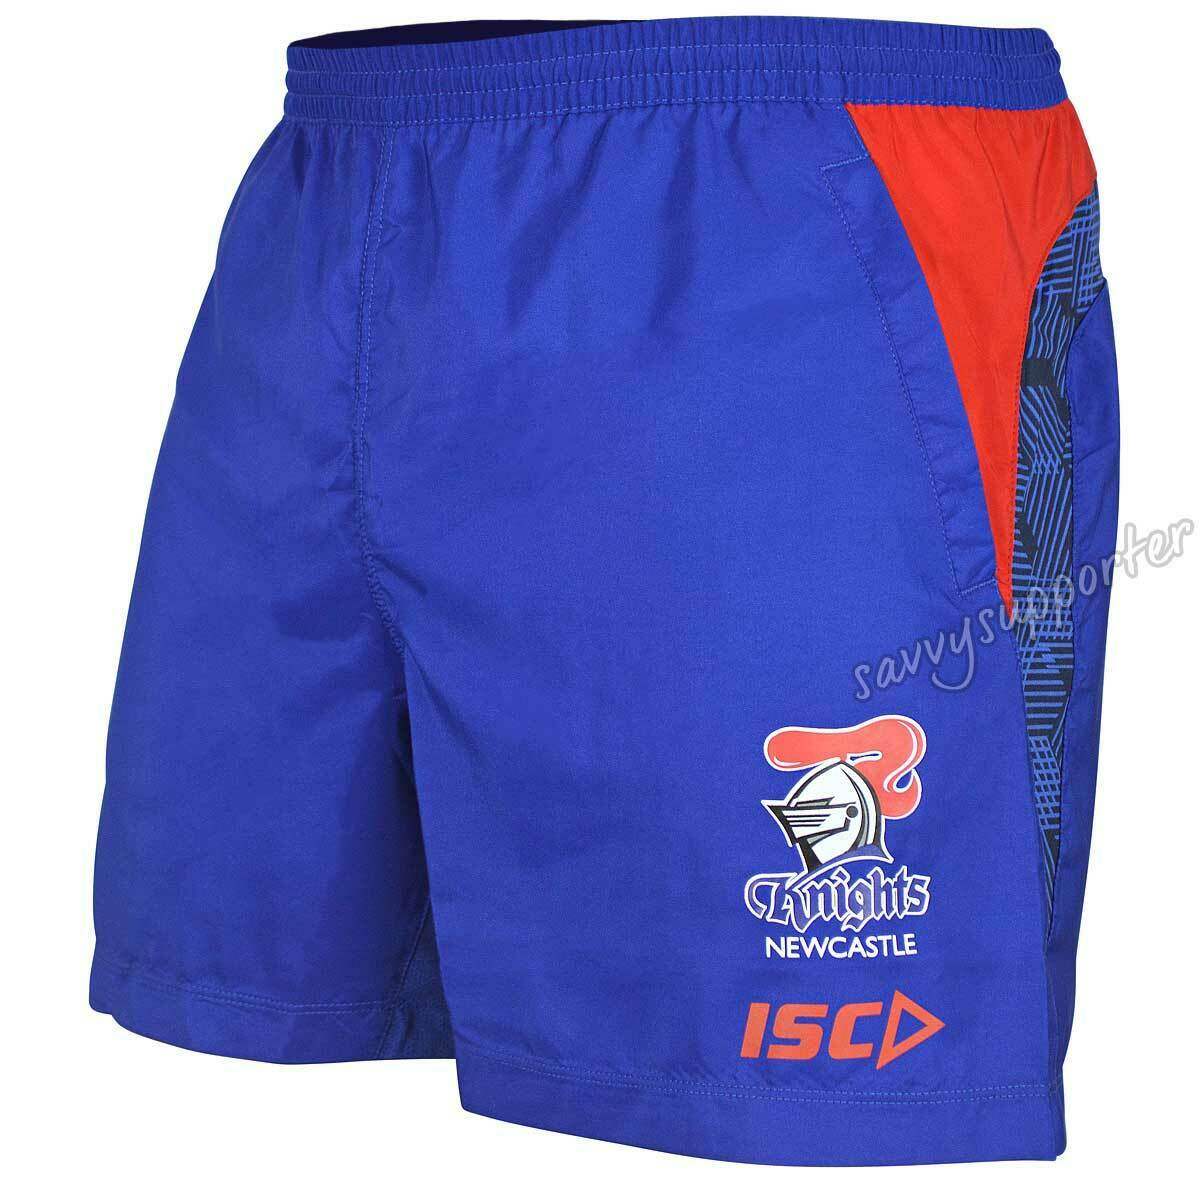 Newcastle Knights 2019 NRL Mens Training Shorts Sizes S-5XL BNWT